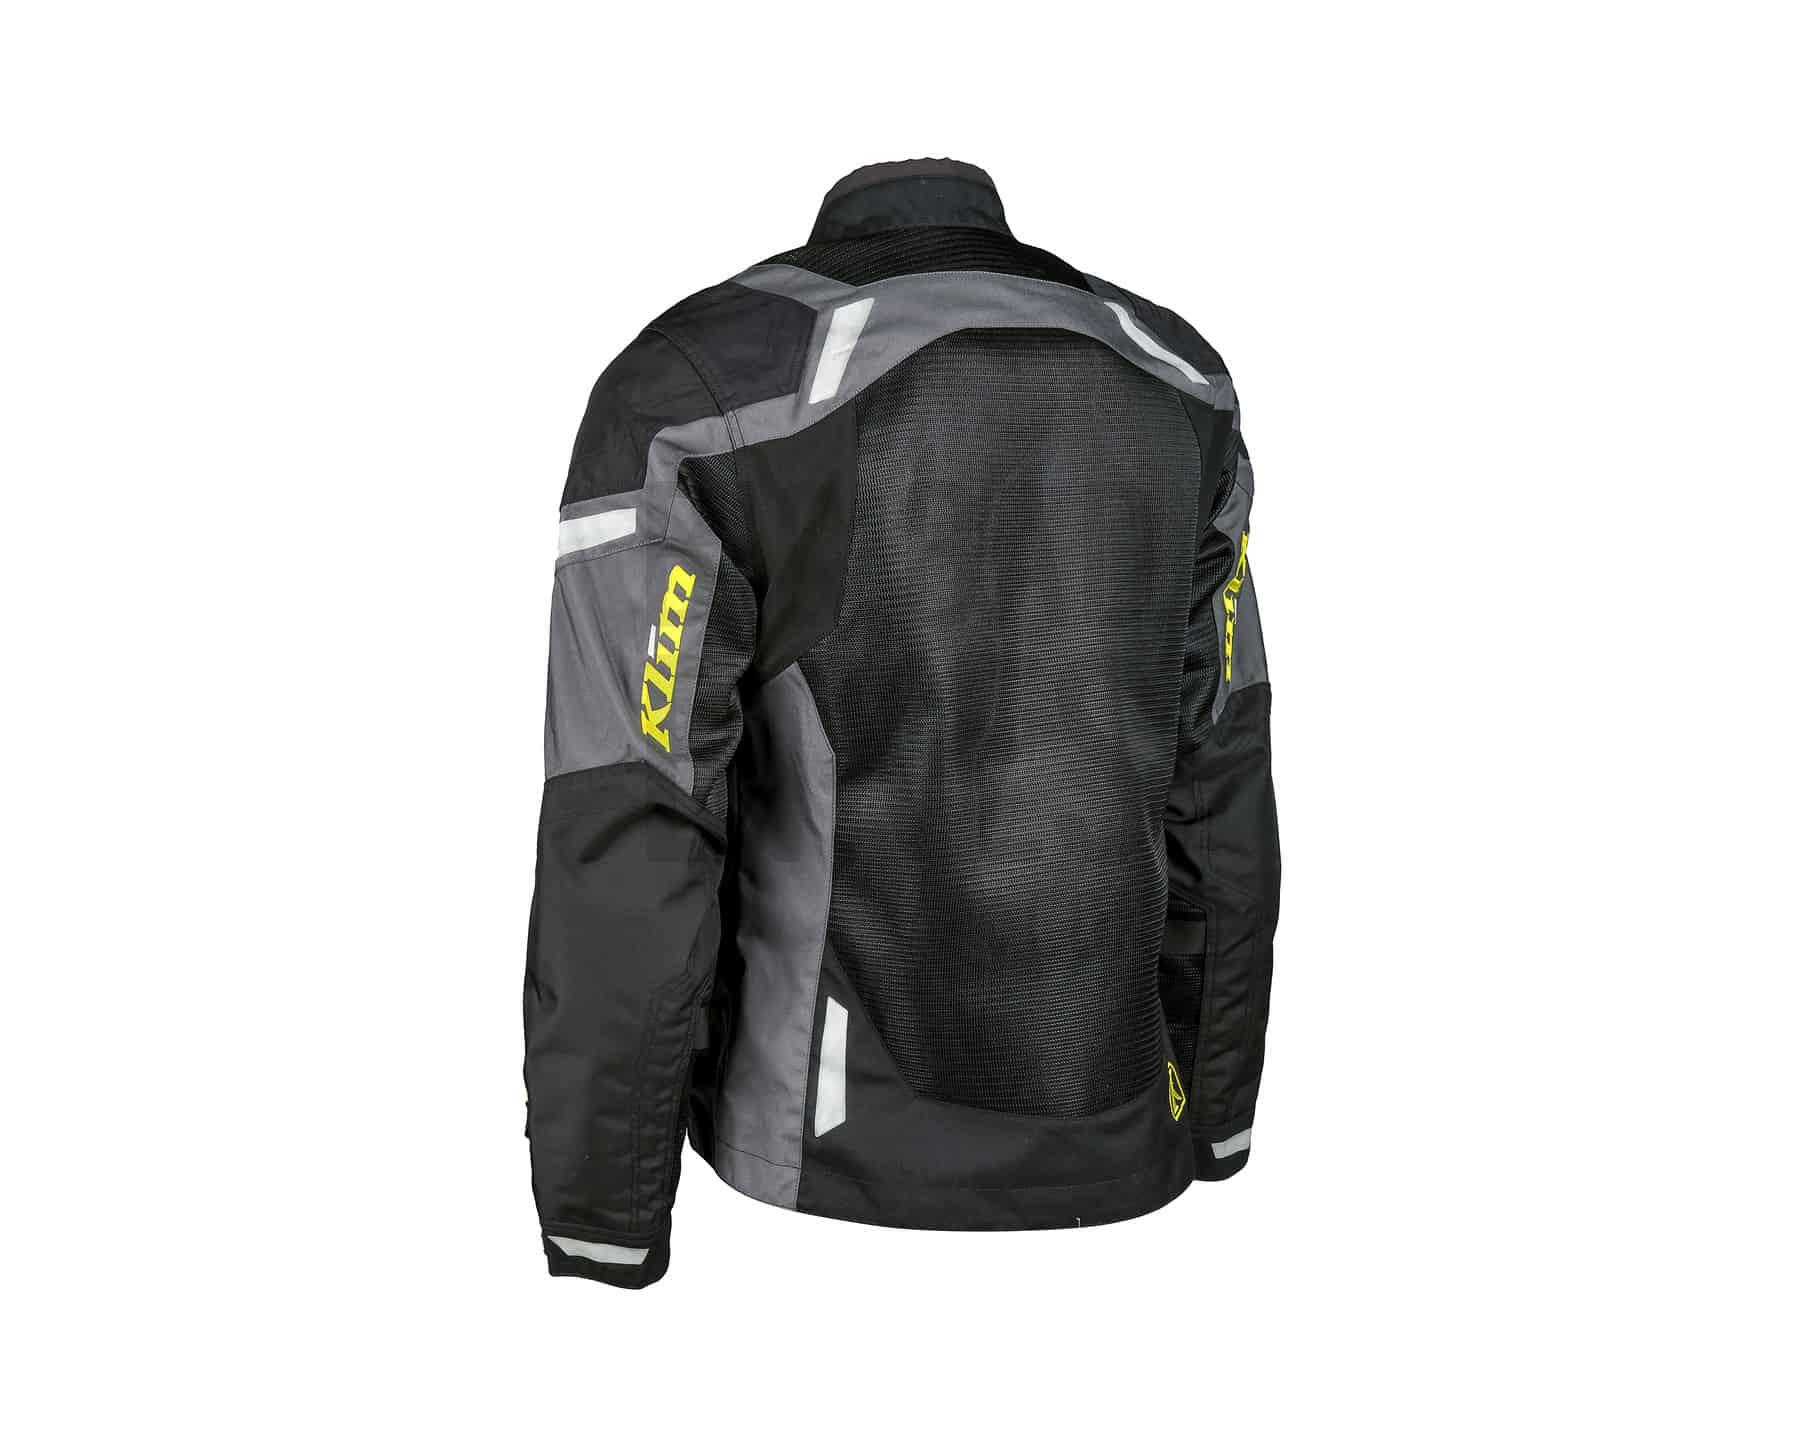 Induction Jacket_5060-002_Dark Gray_05